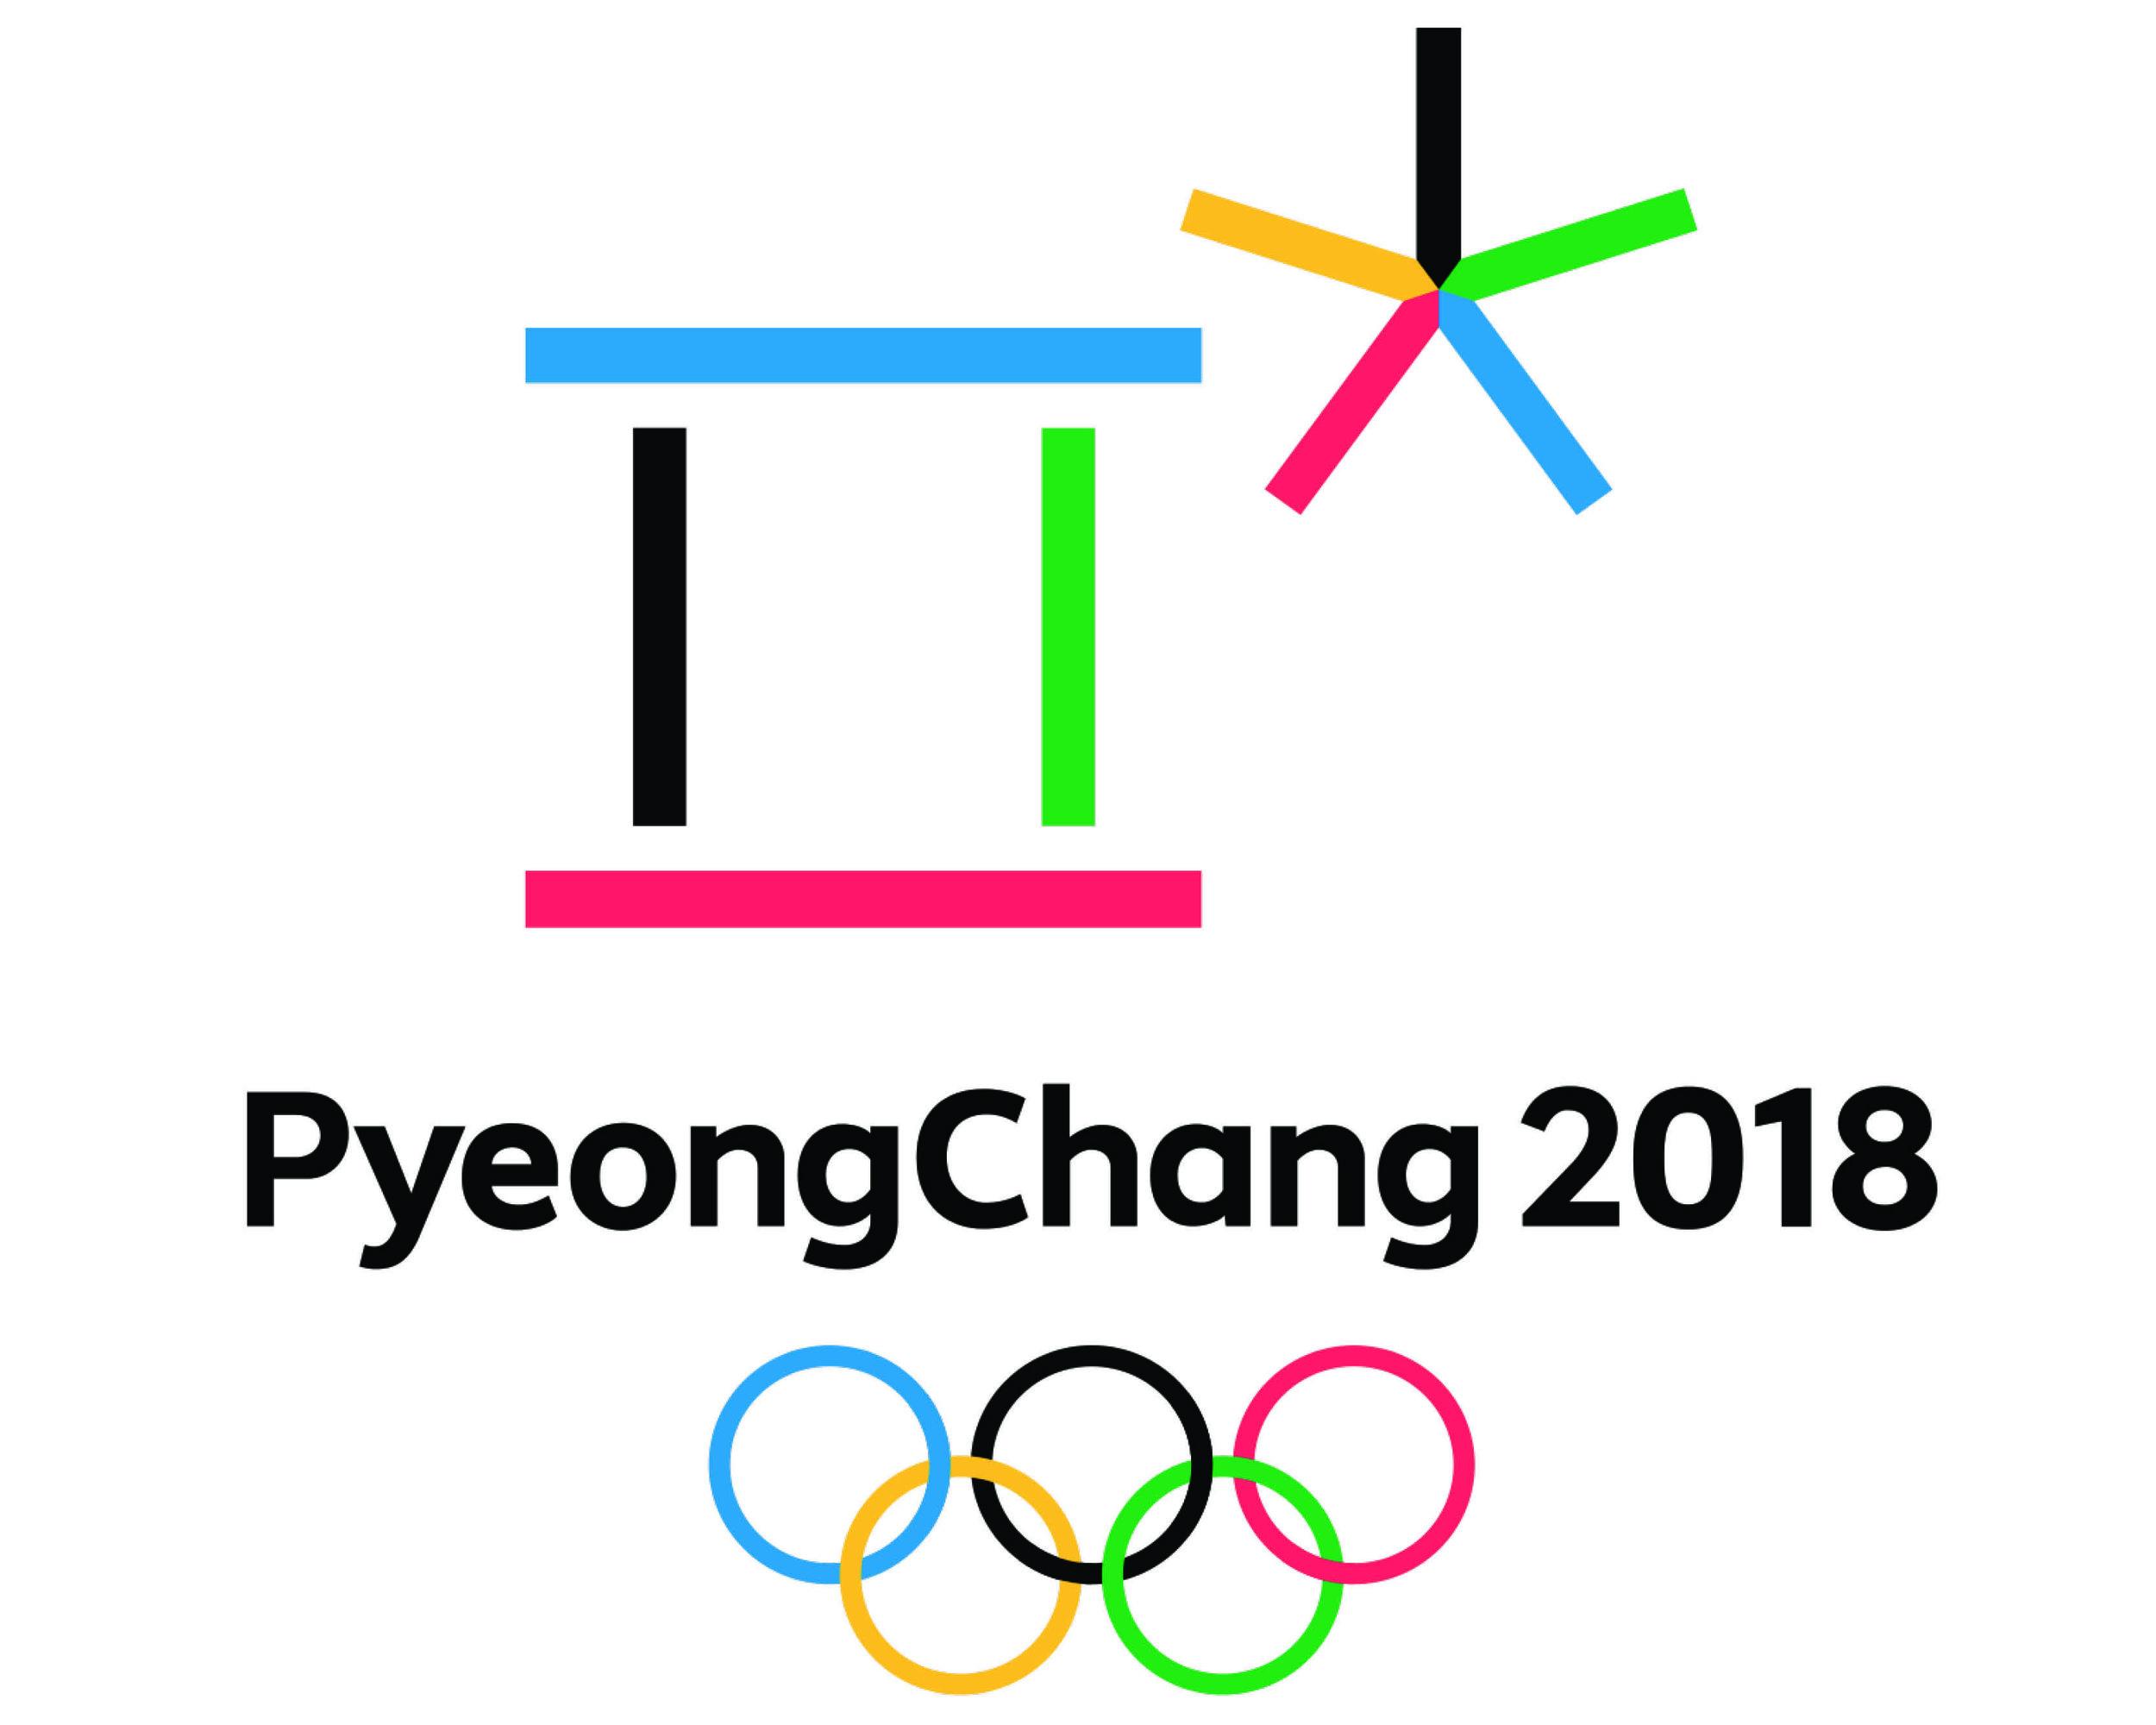 PyeongChang_2018_Winter_Olympics.jpg